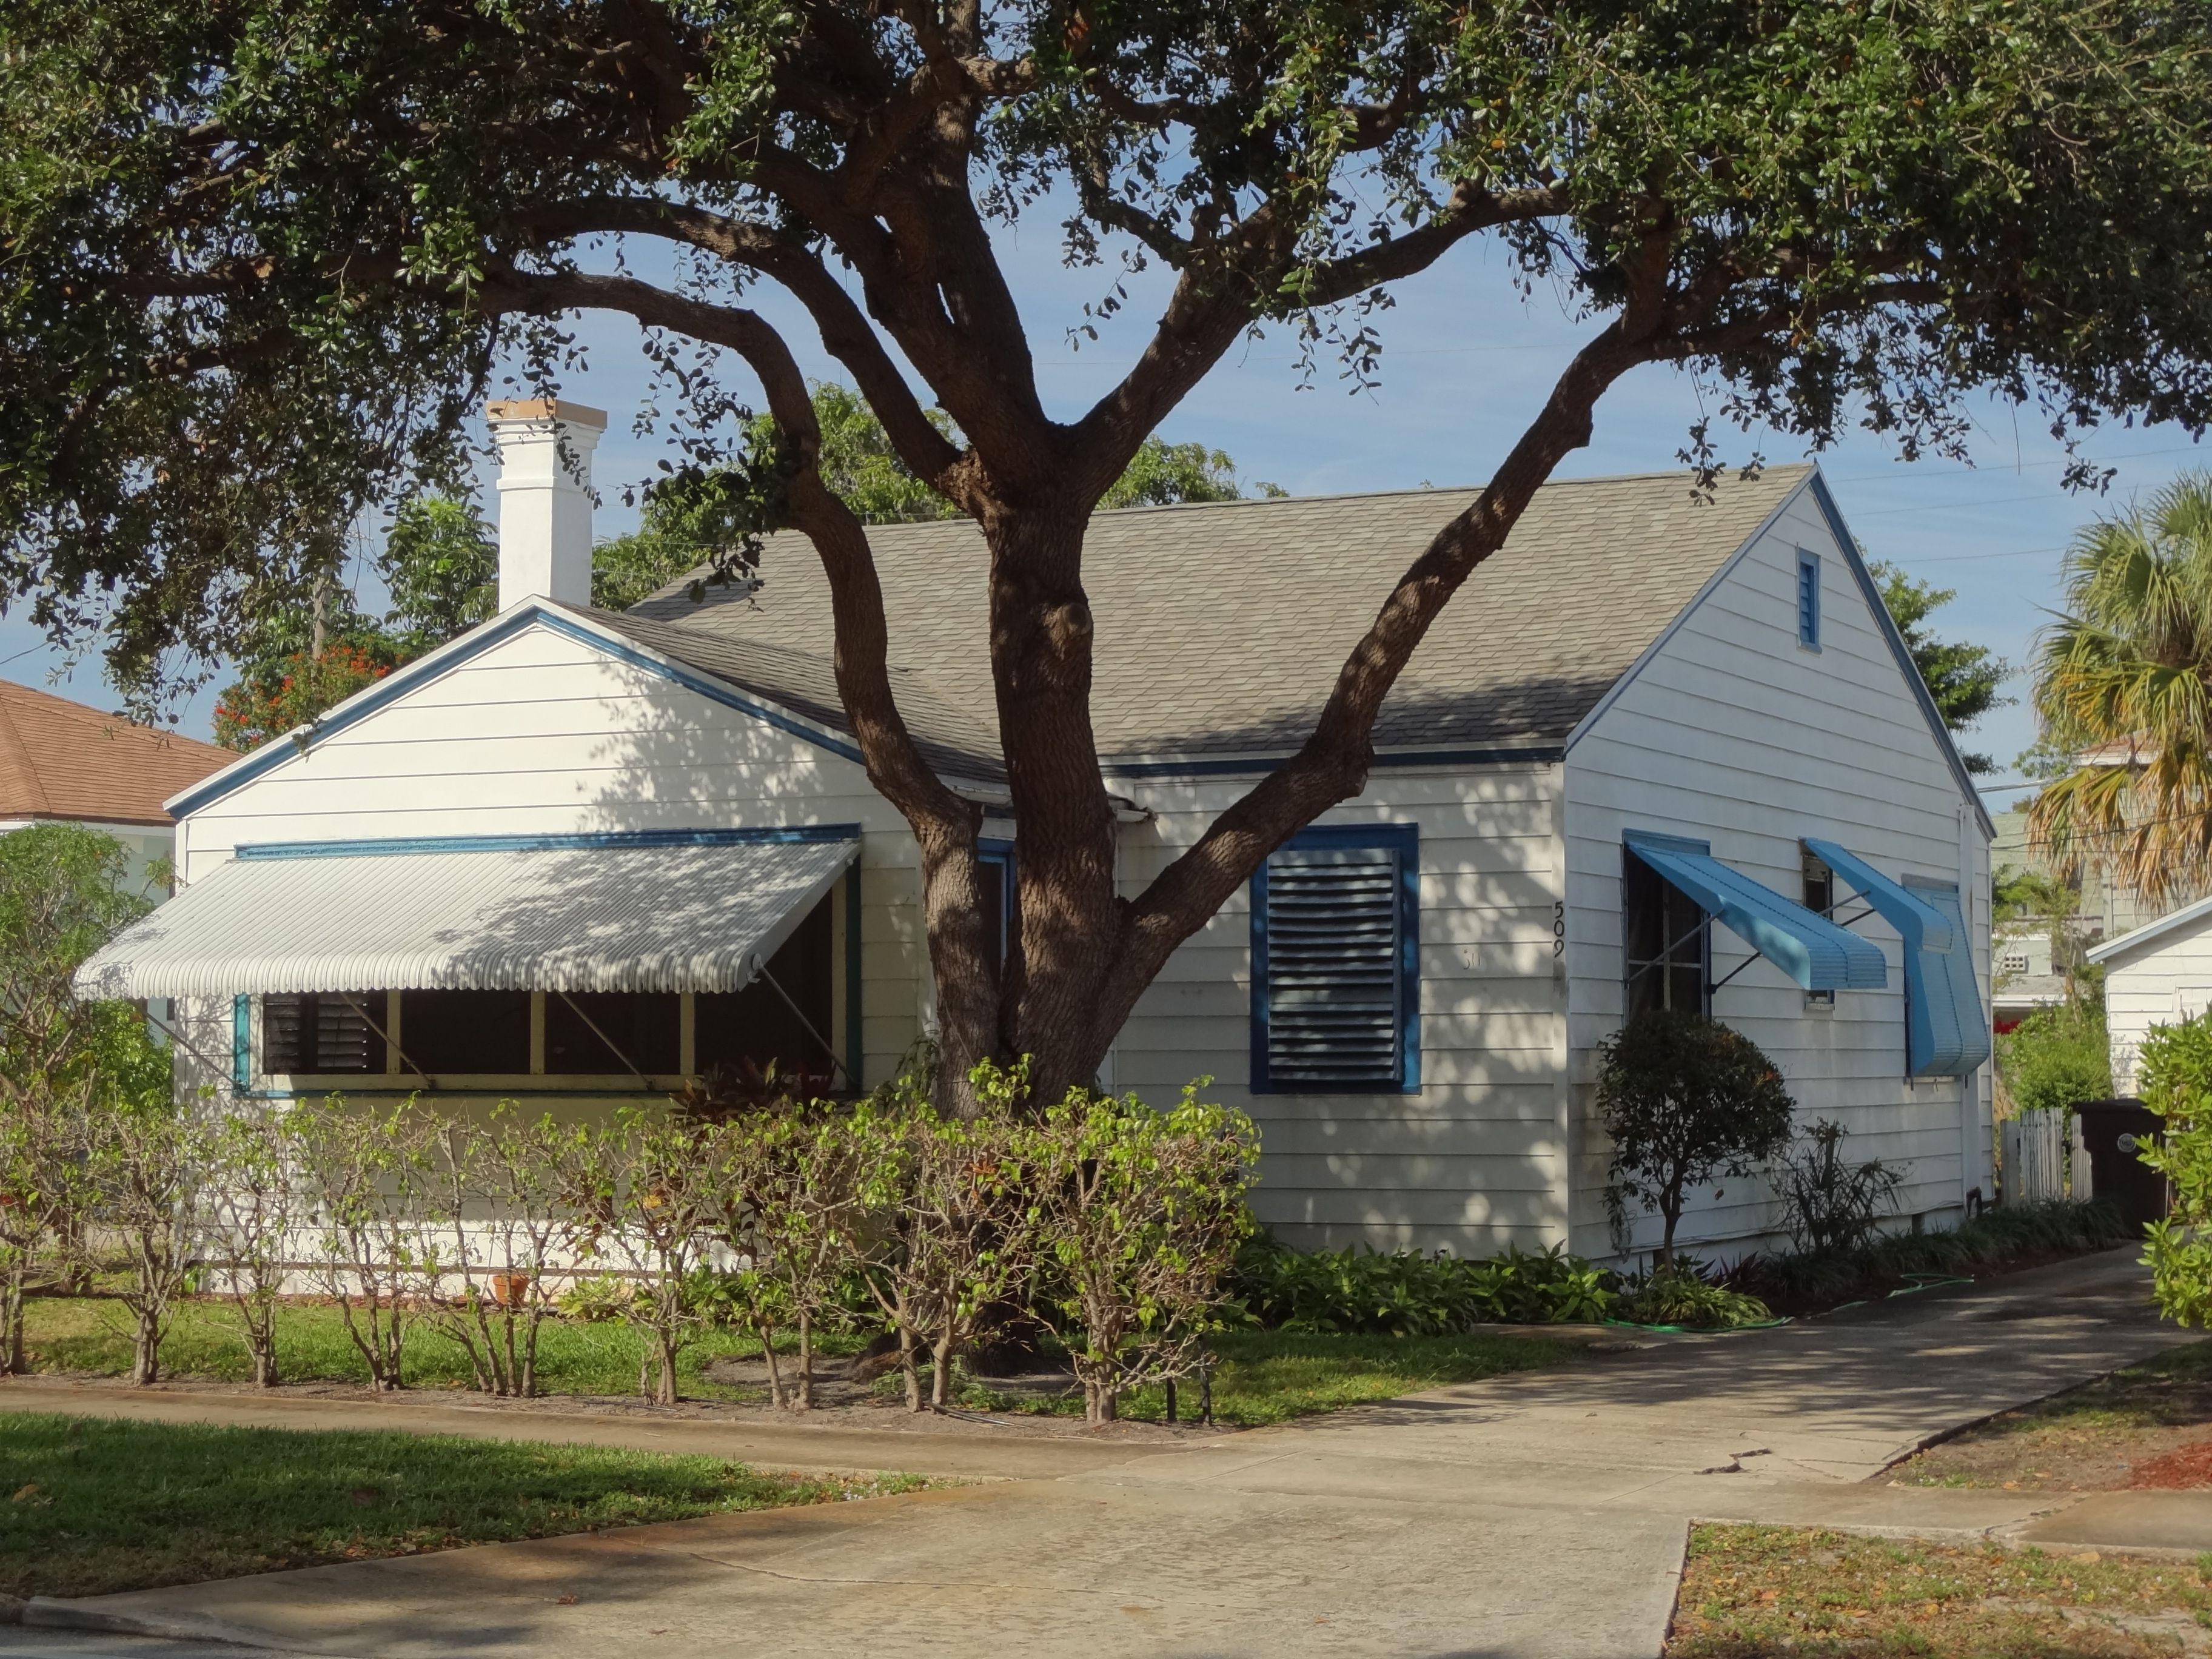 1c70dd4678466518a29e5d75935f8d43 - Homes For Rent Evergrene Palm Beach Gardens